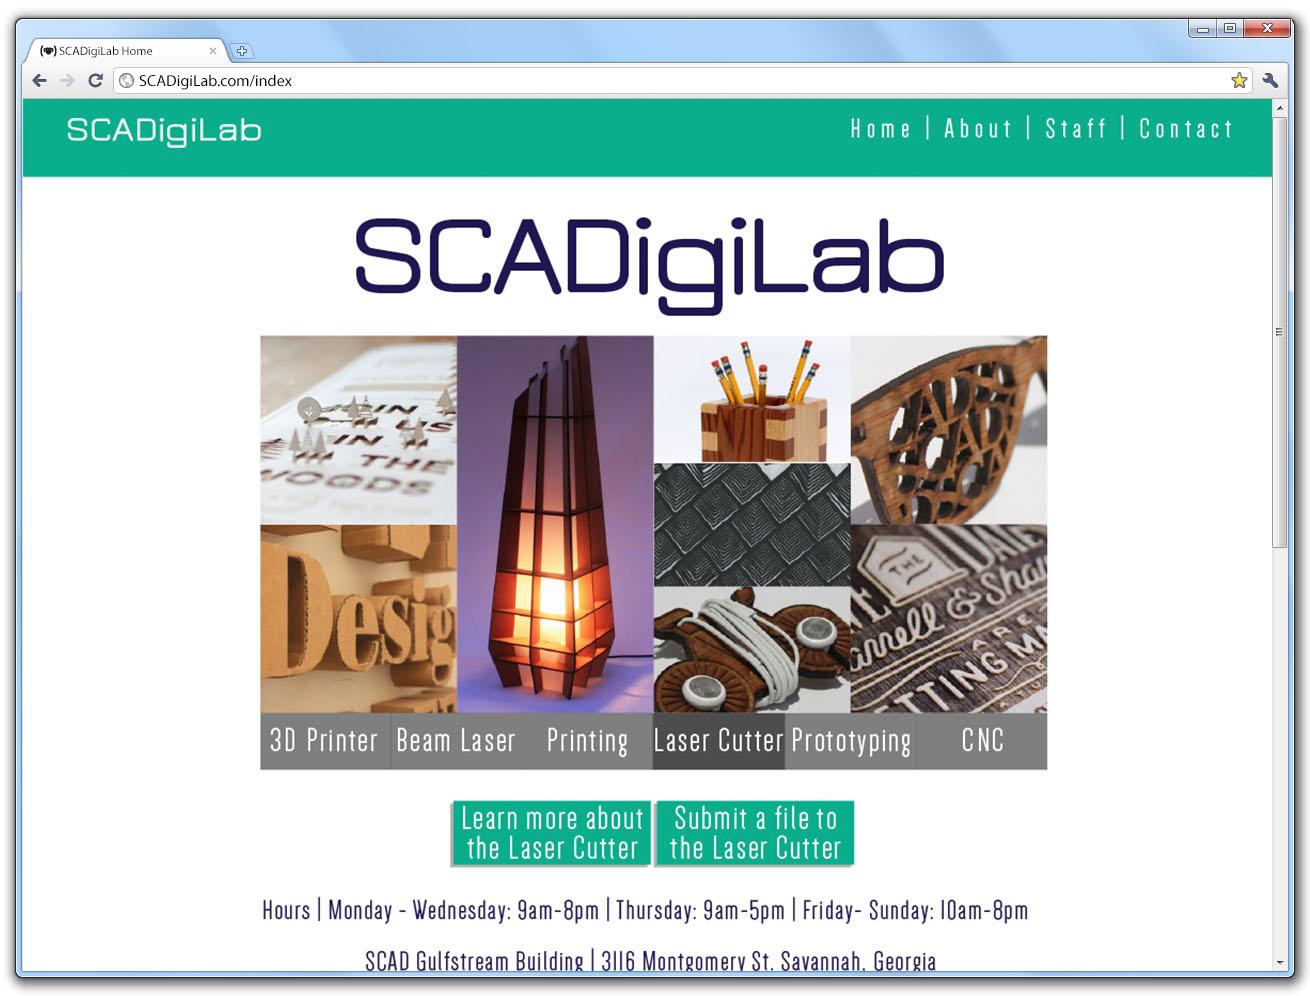 SCAD DigiLab Home Page